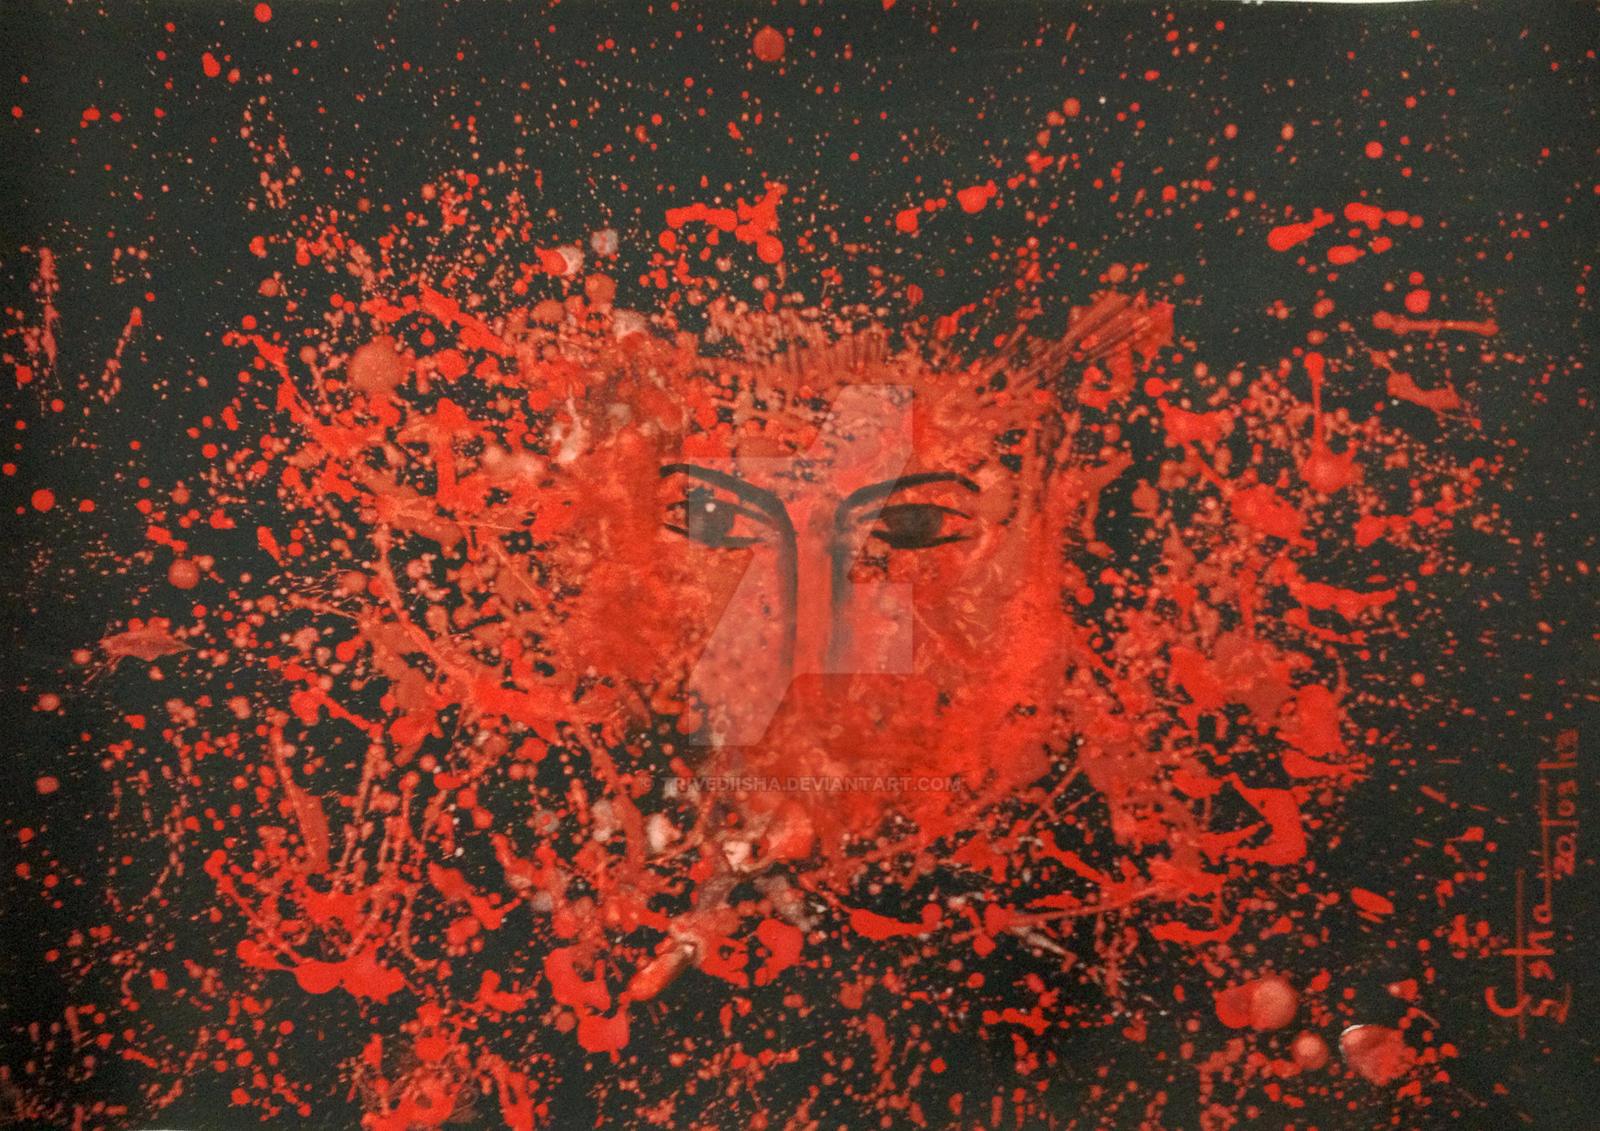 Burning Red by Isha Trivedi by trivediisha